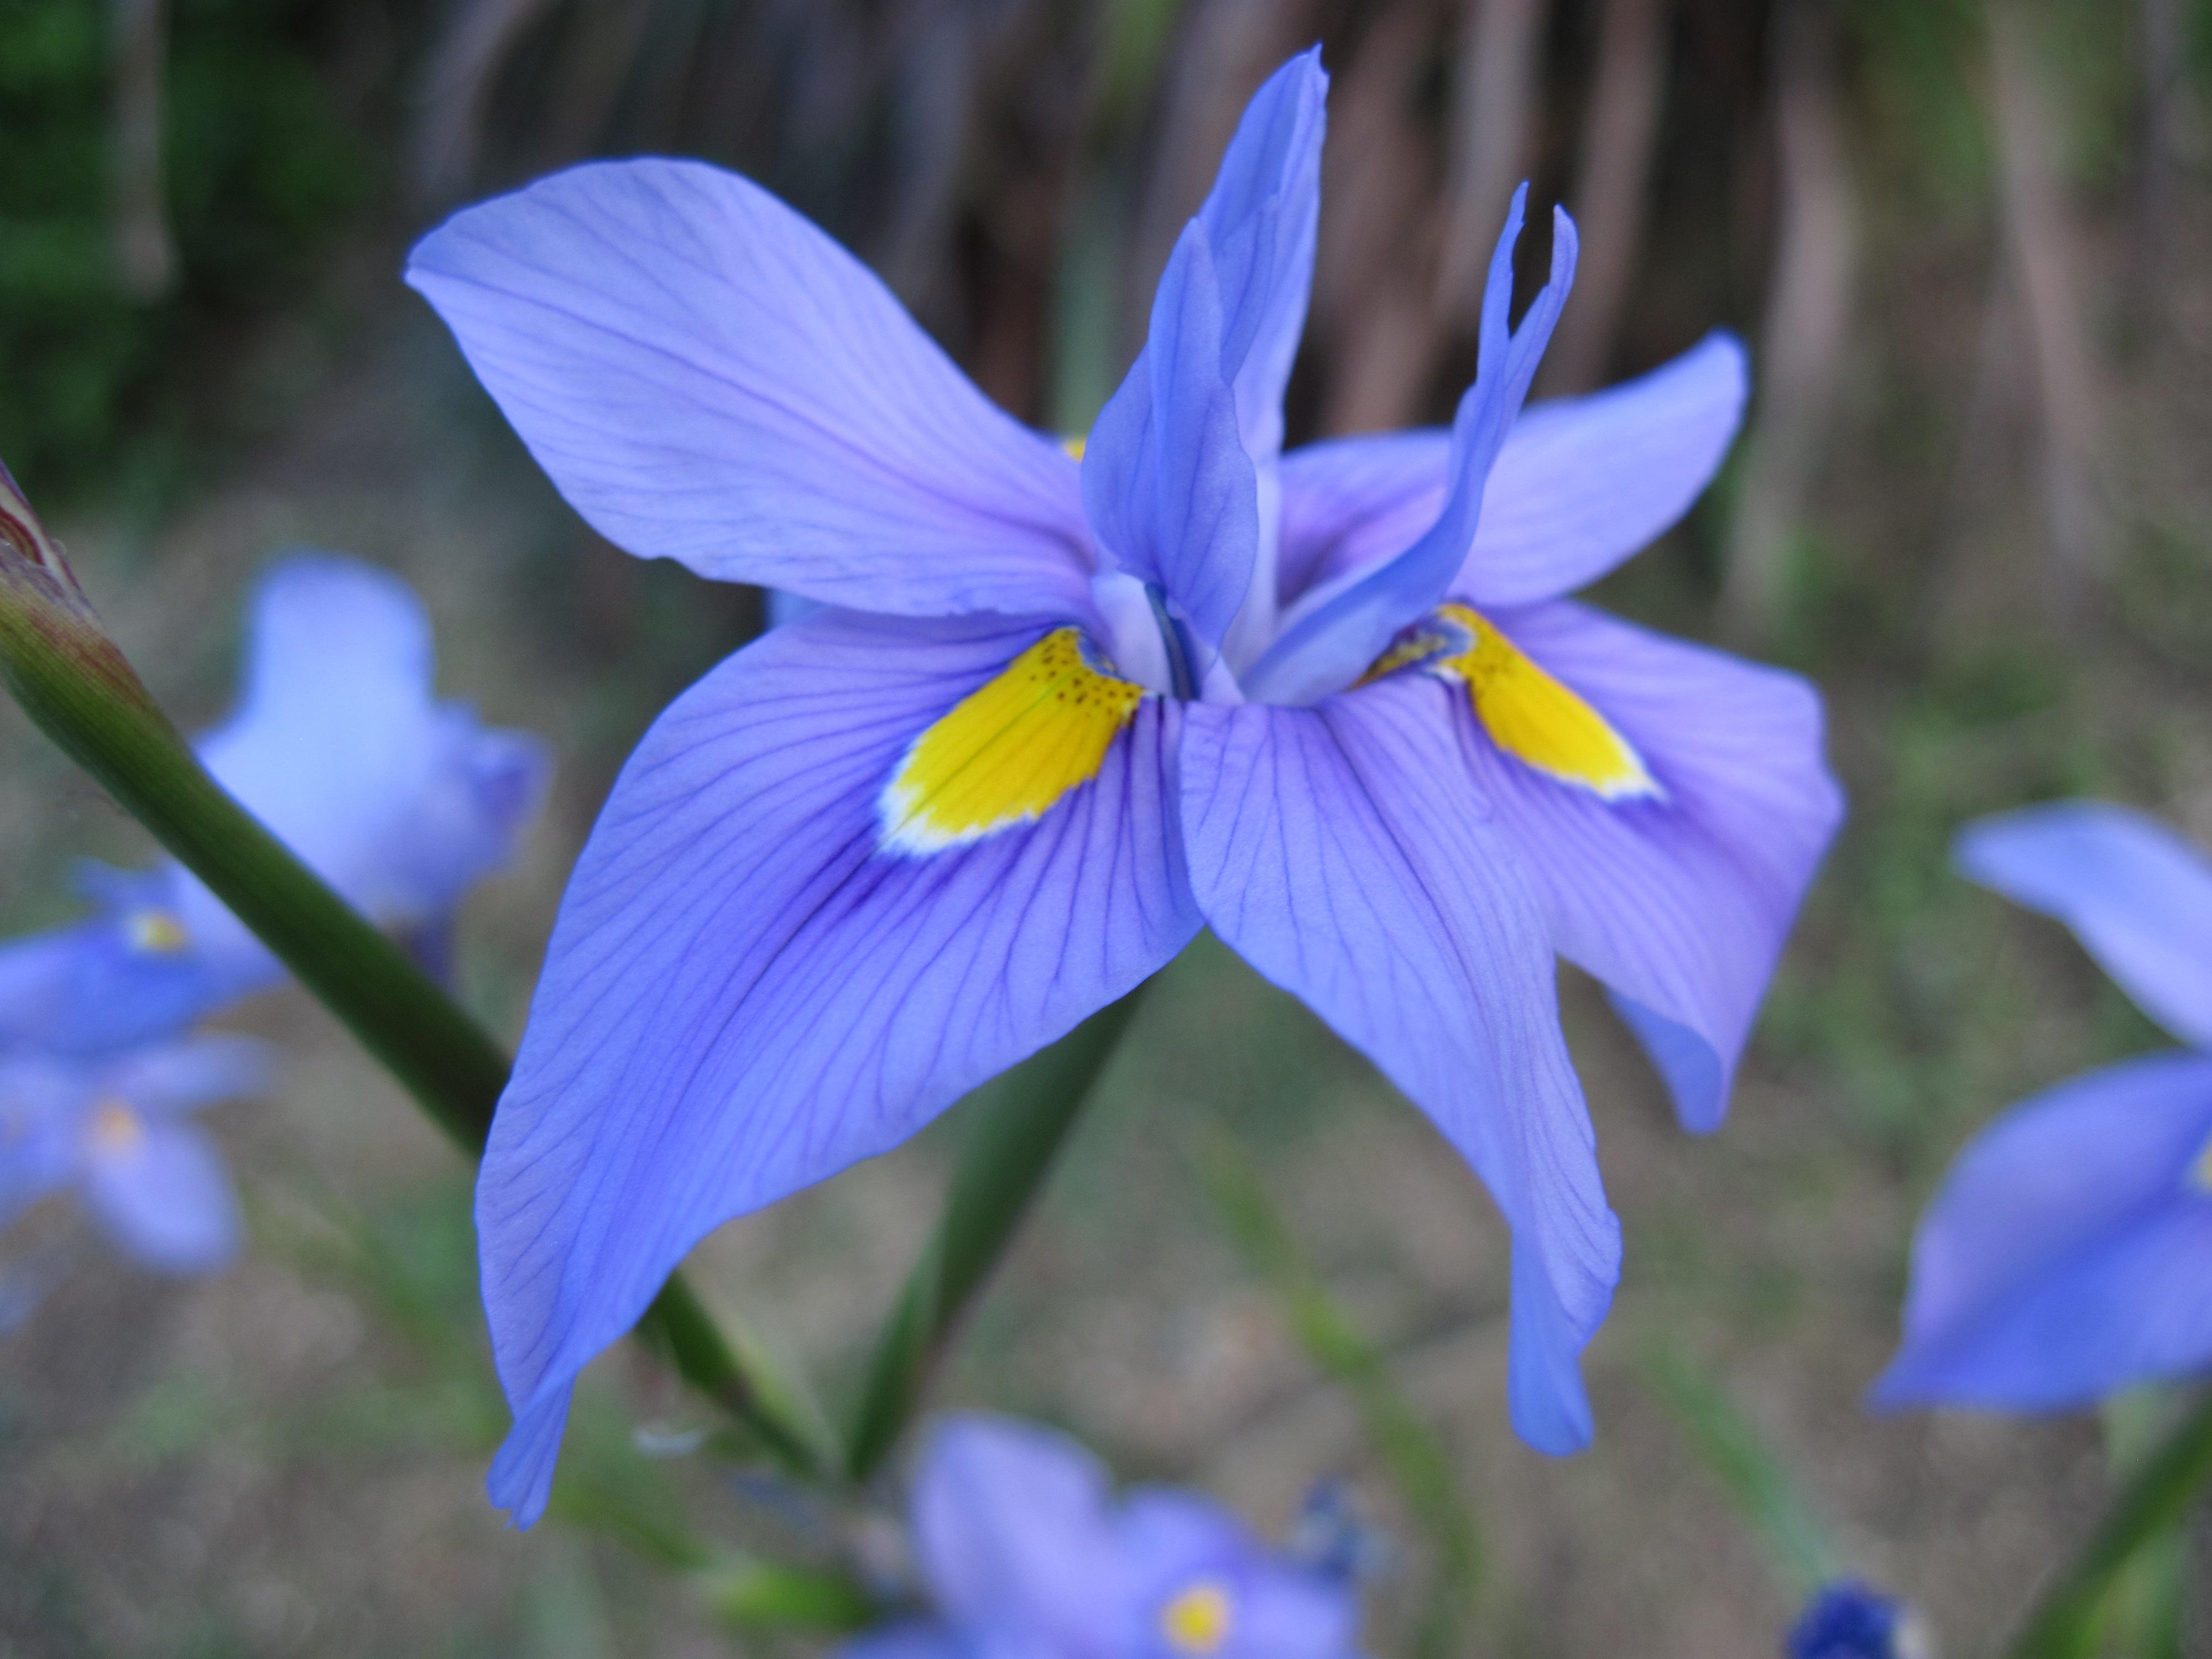 Free photo blue iris flower outdoors nature natural free blue iris flower izmirmasajfo